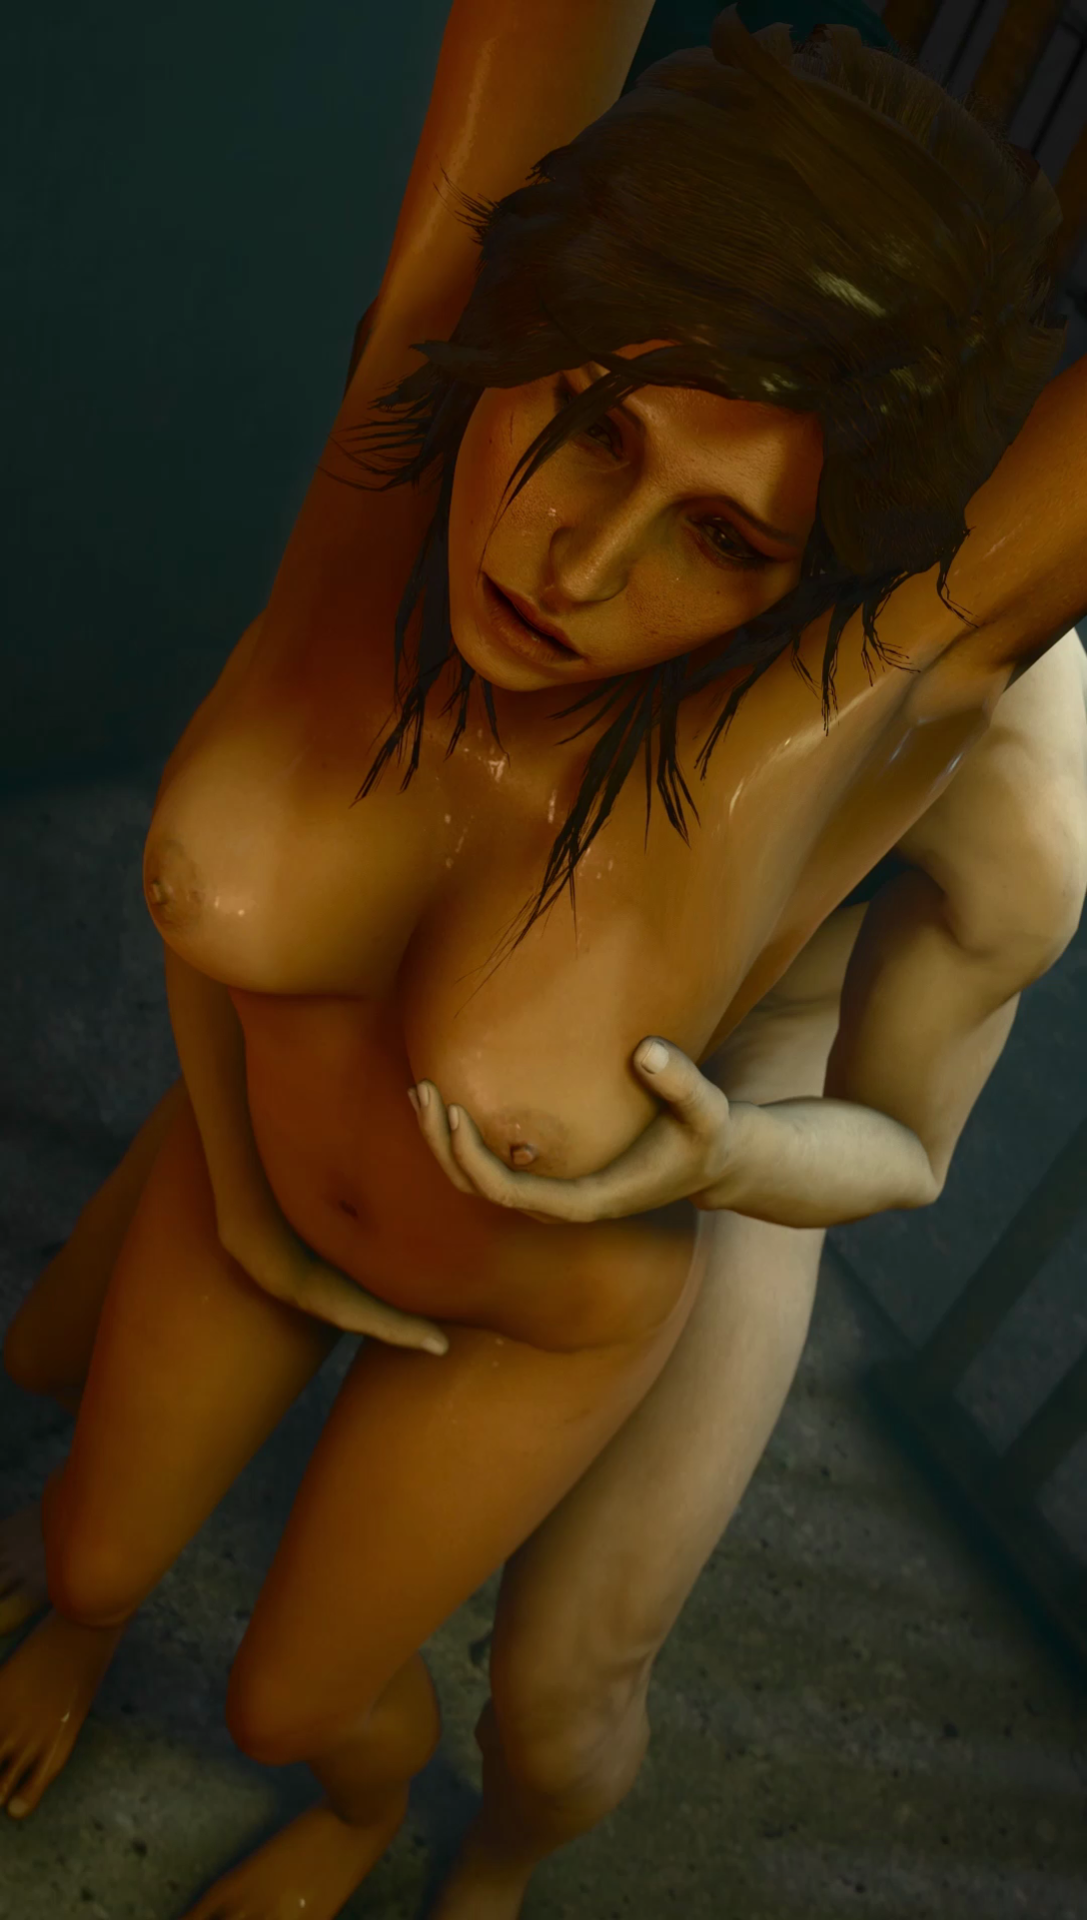 Explosivere cumshot action bei porn giphy